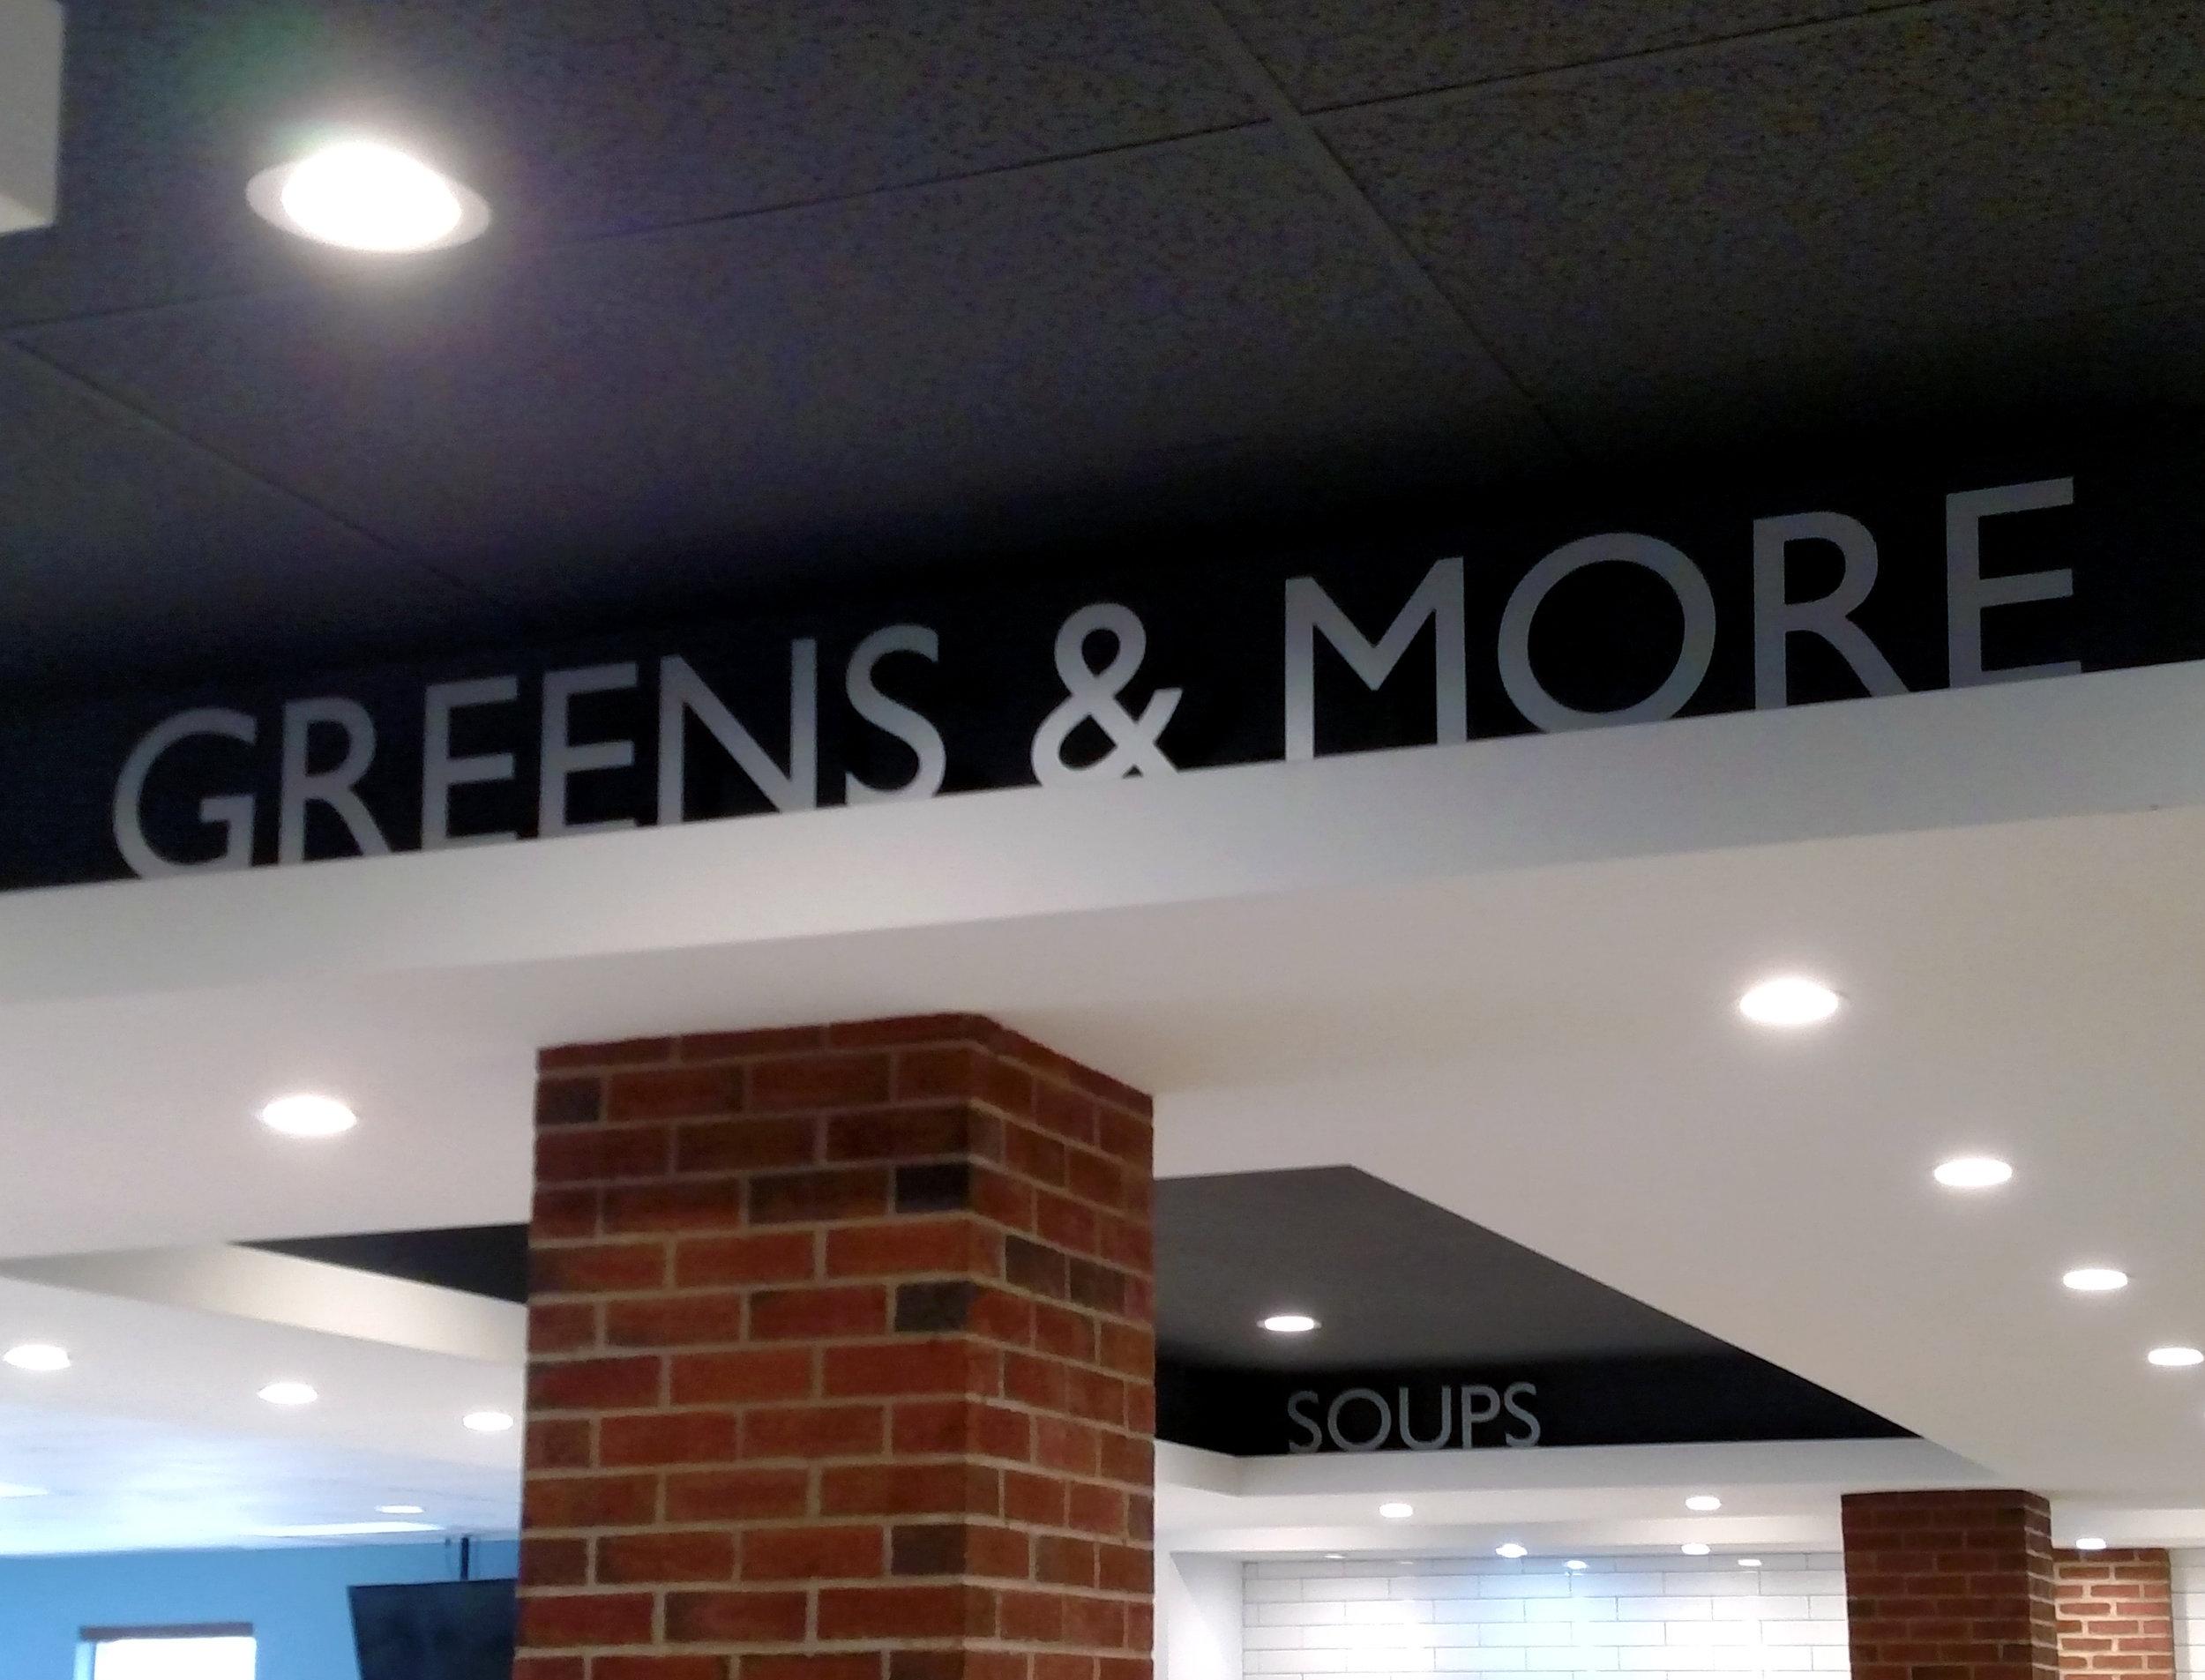 Keystone Greens & More Signage.jpg